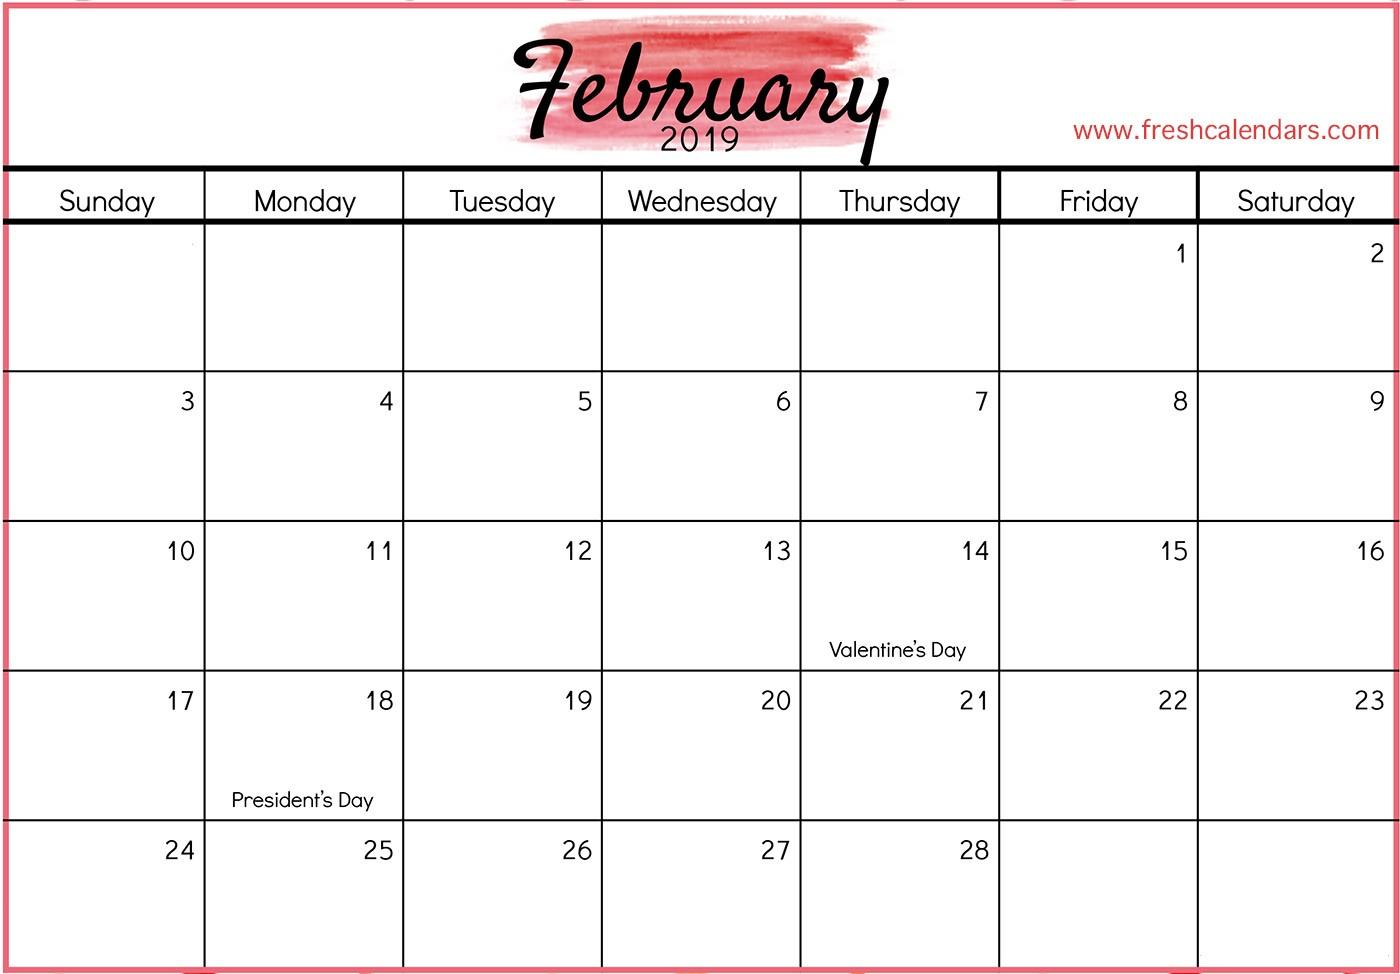 February Printable Calendar 2019 Blank February 2019 Calendar Printable Templates